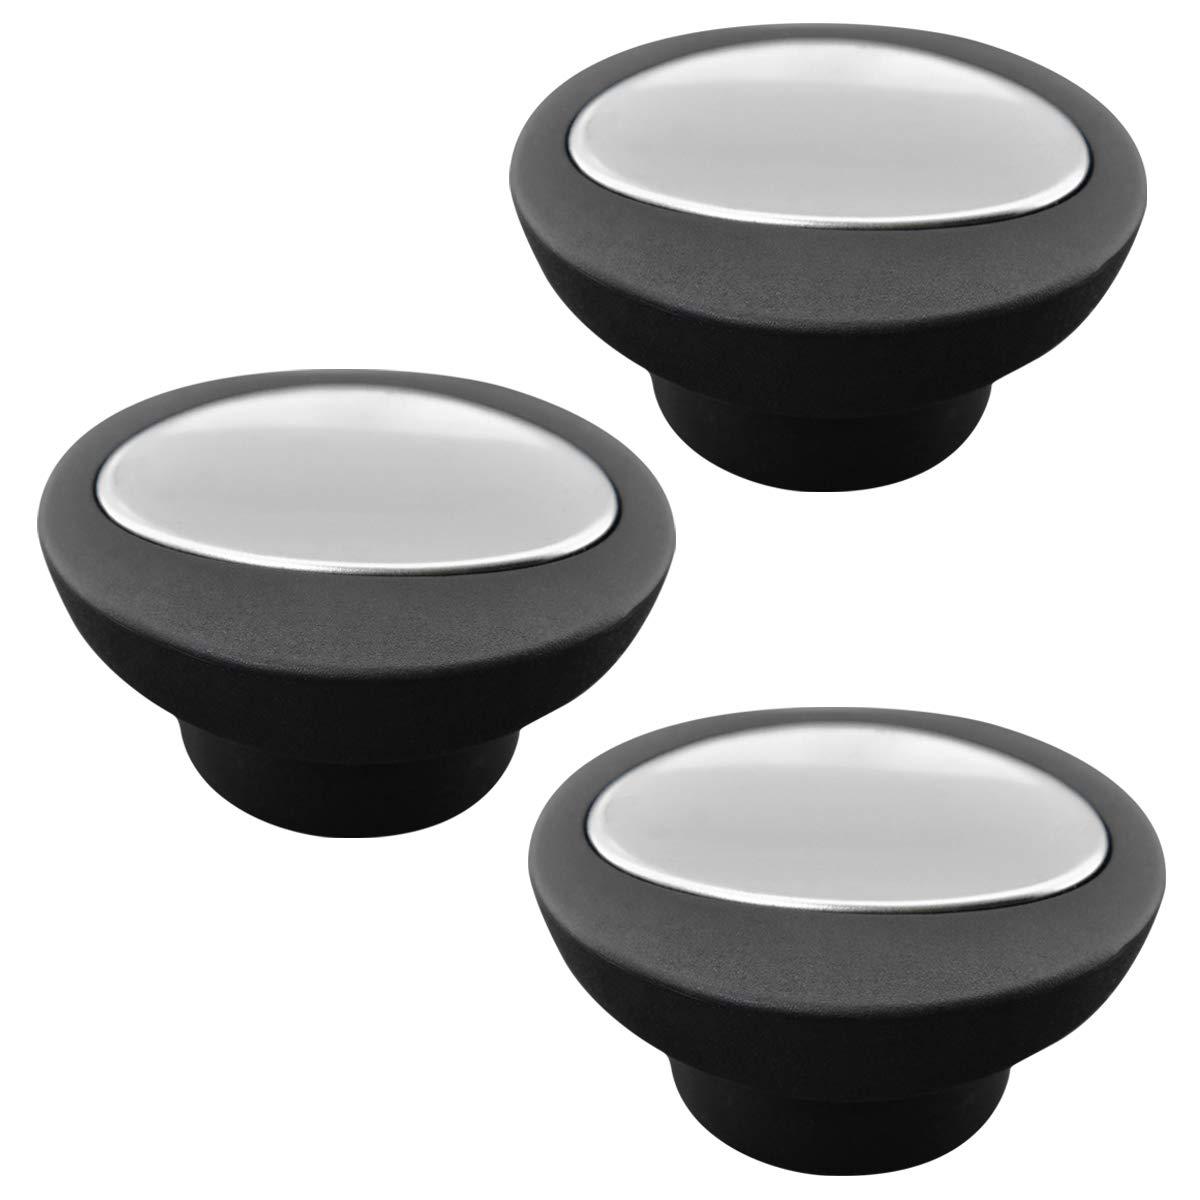 Universal Pot Lid Replacement Knobs Pan Lid Holding Handles (3 Pcs) black